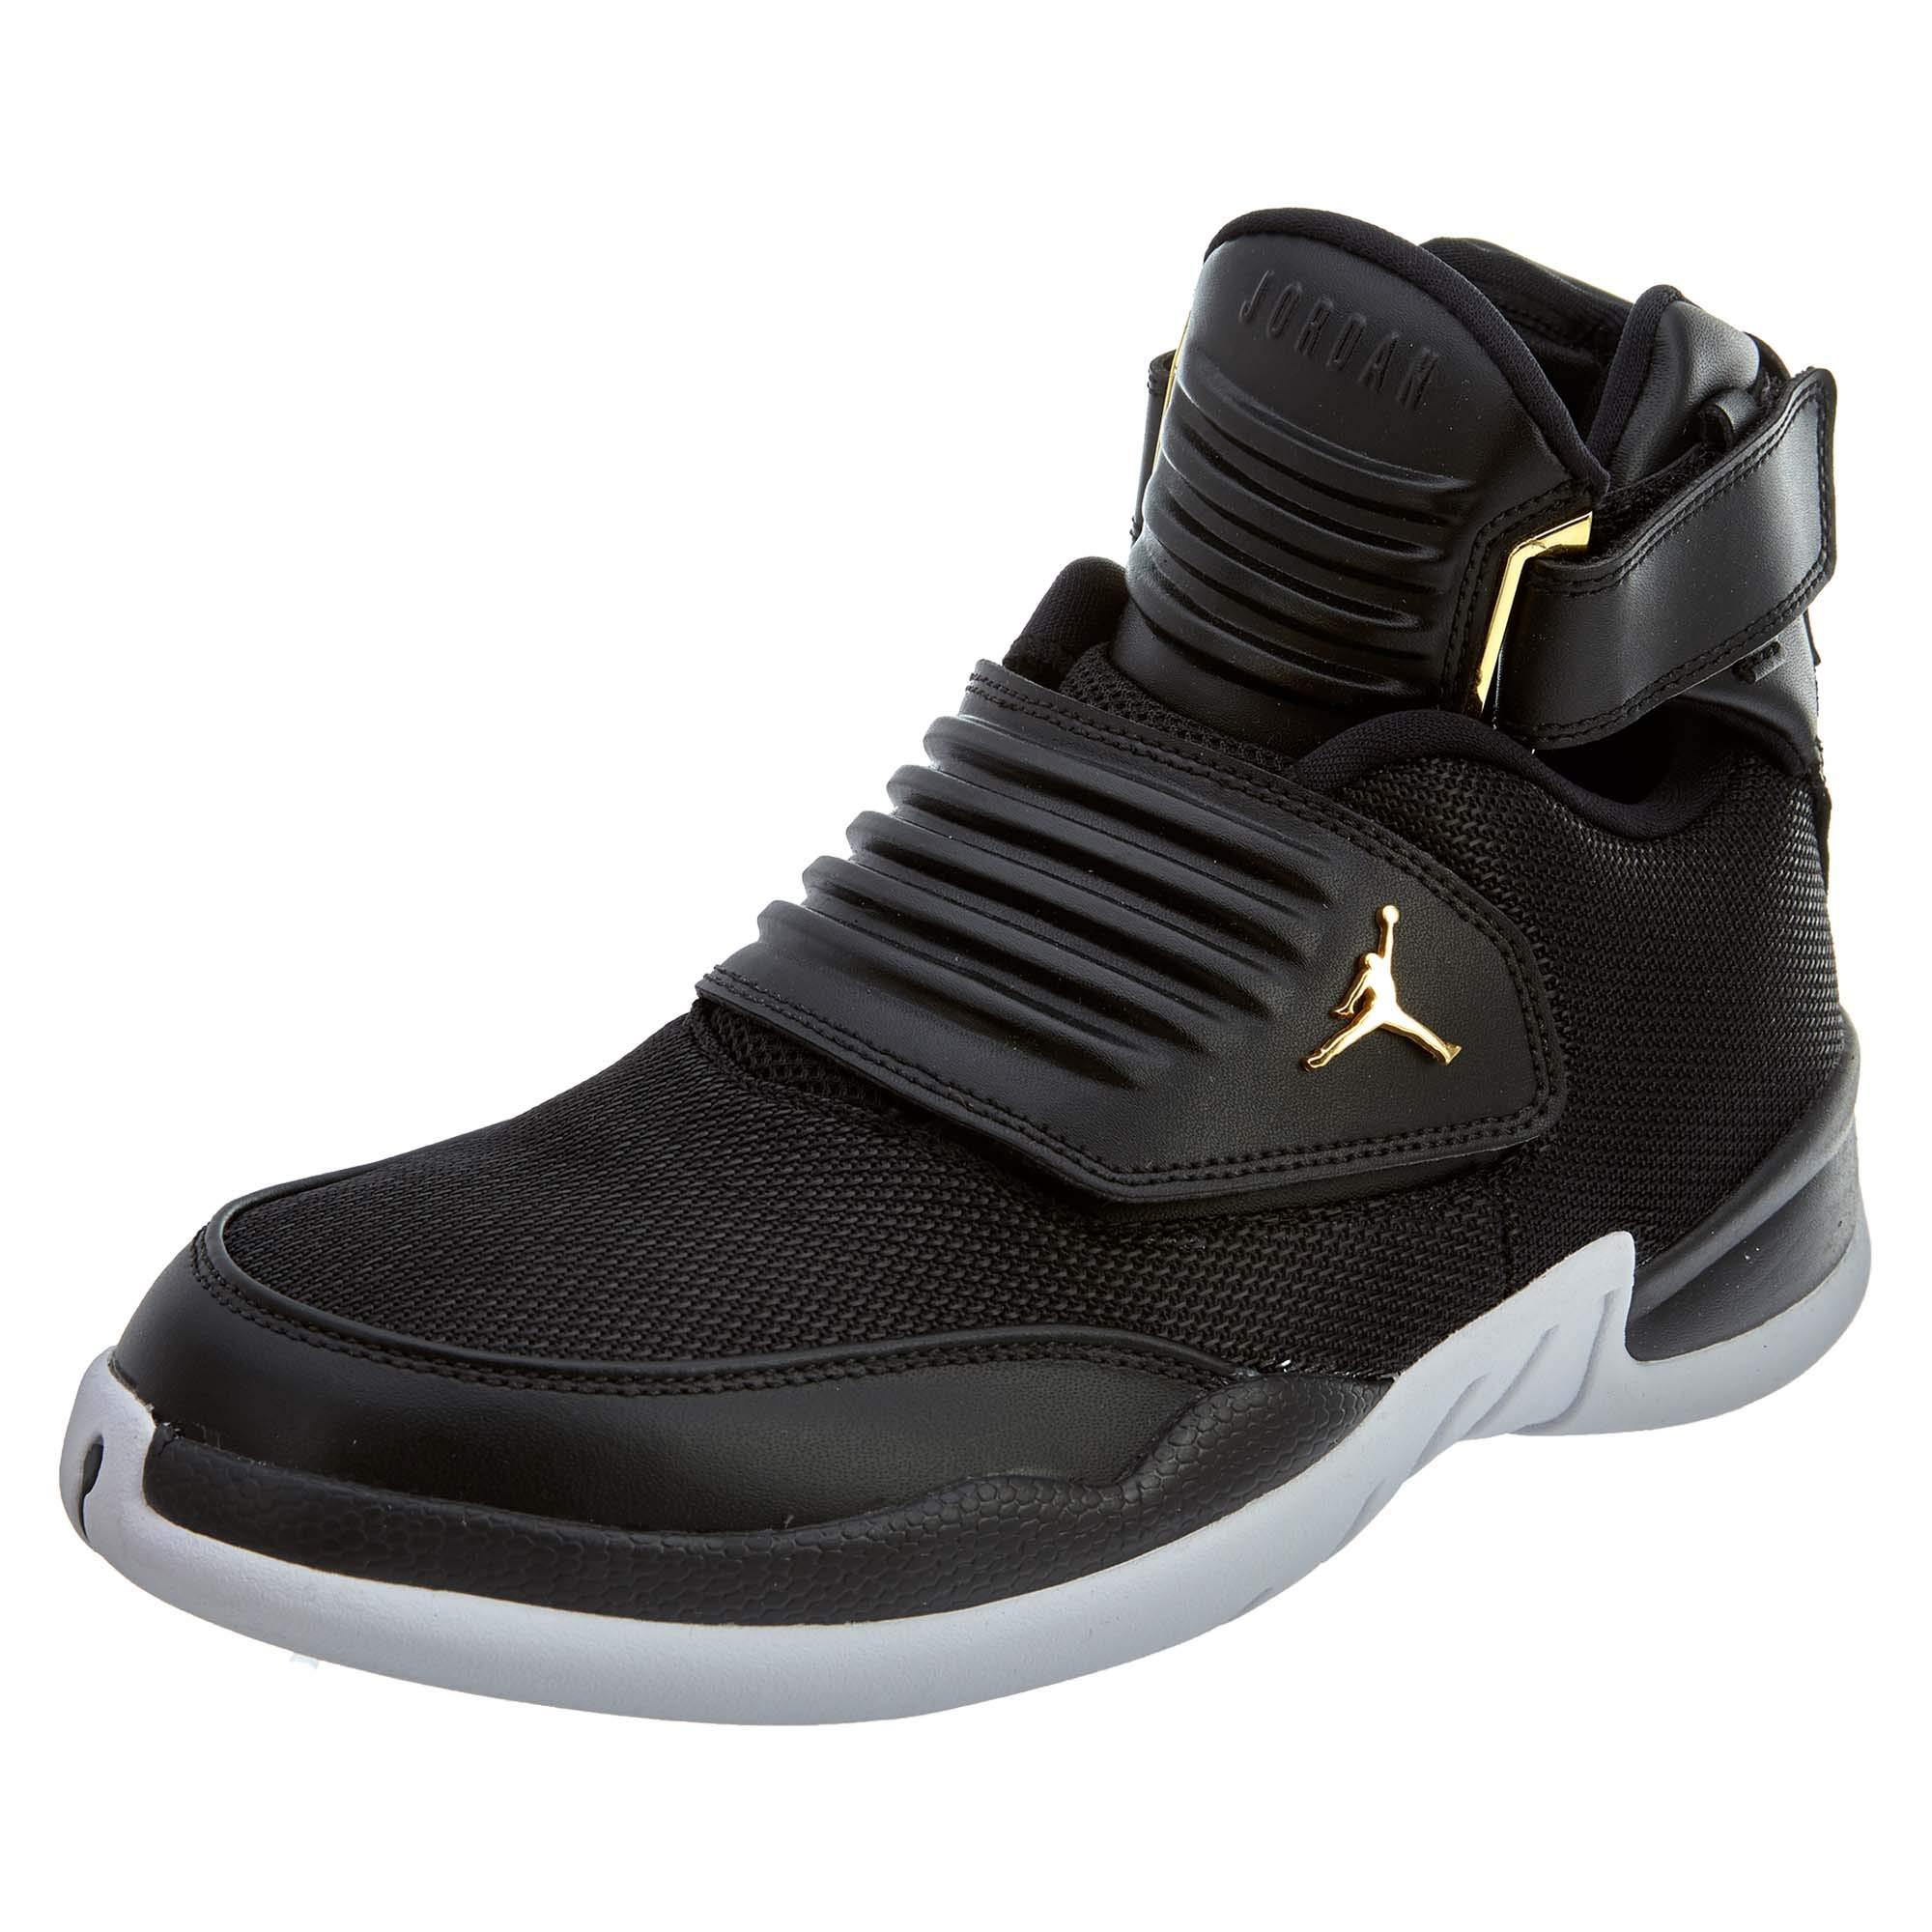 competitive price 6f851 7cdfe Galleon - Nike Men s Jordan Generation 23 Black   - White Ankle-High  Basketball Shoe 11M